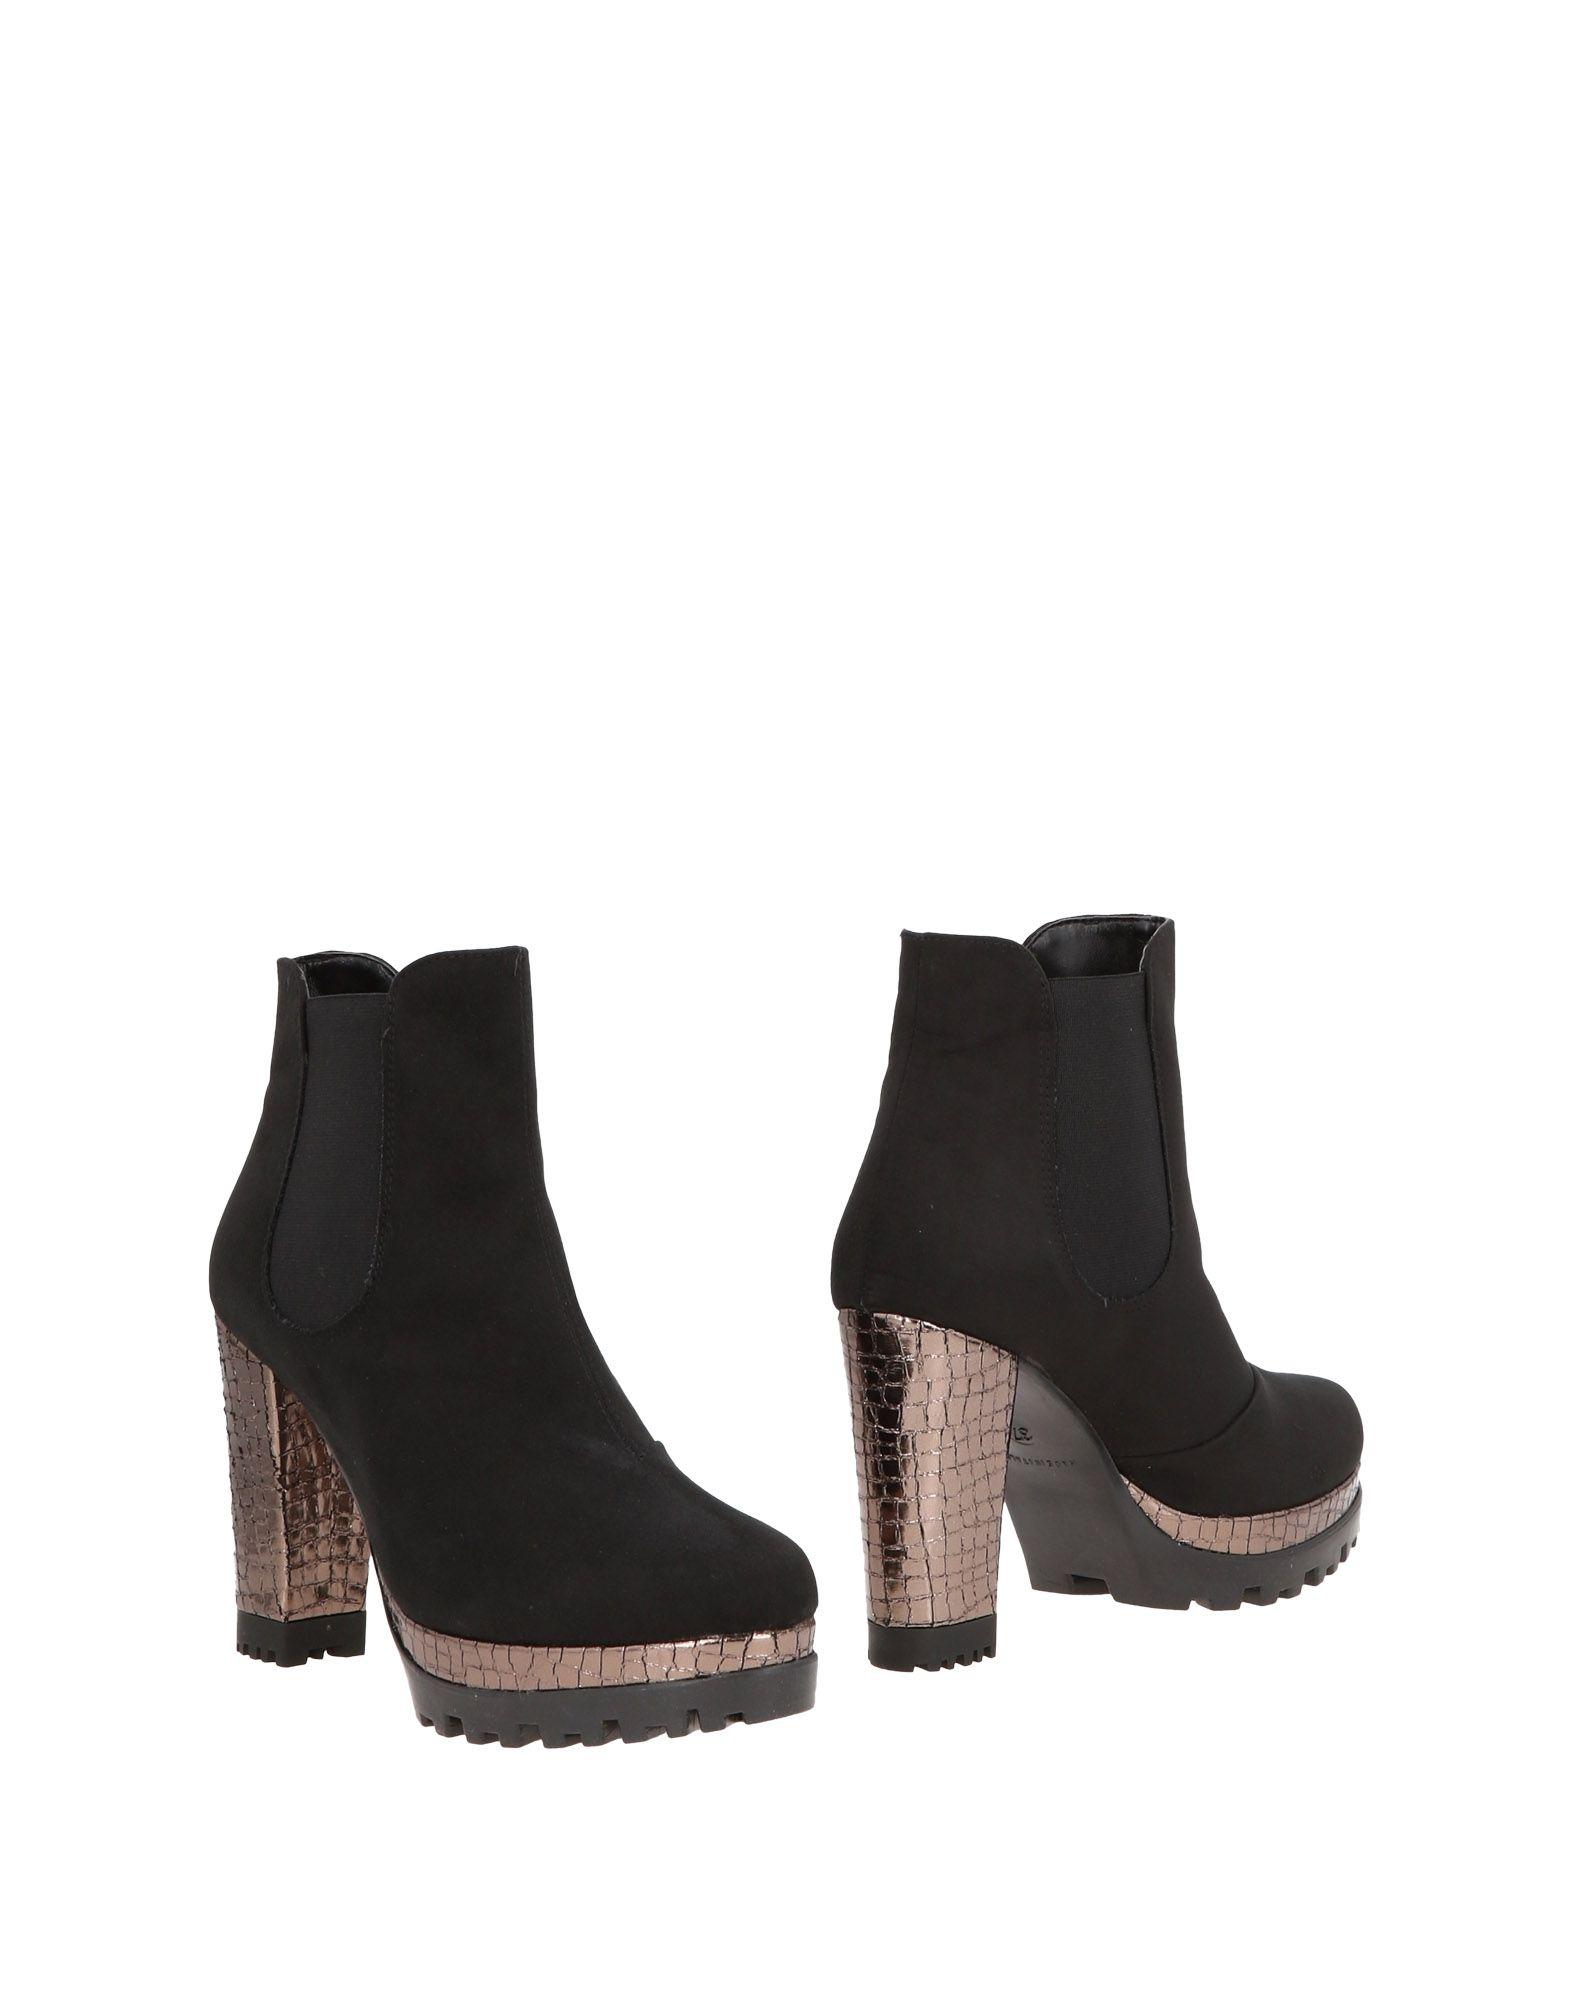 Nila & Women Nila Ankle Boot - Women & Nila & Nila Ankle Boots online on  Australia - 11474948GP 4c7242